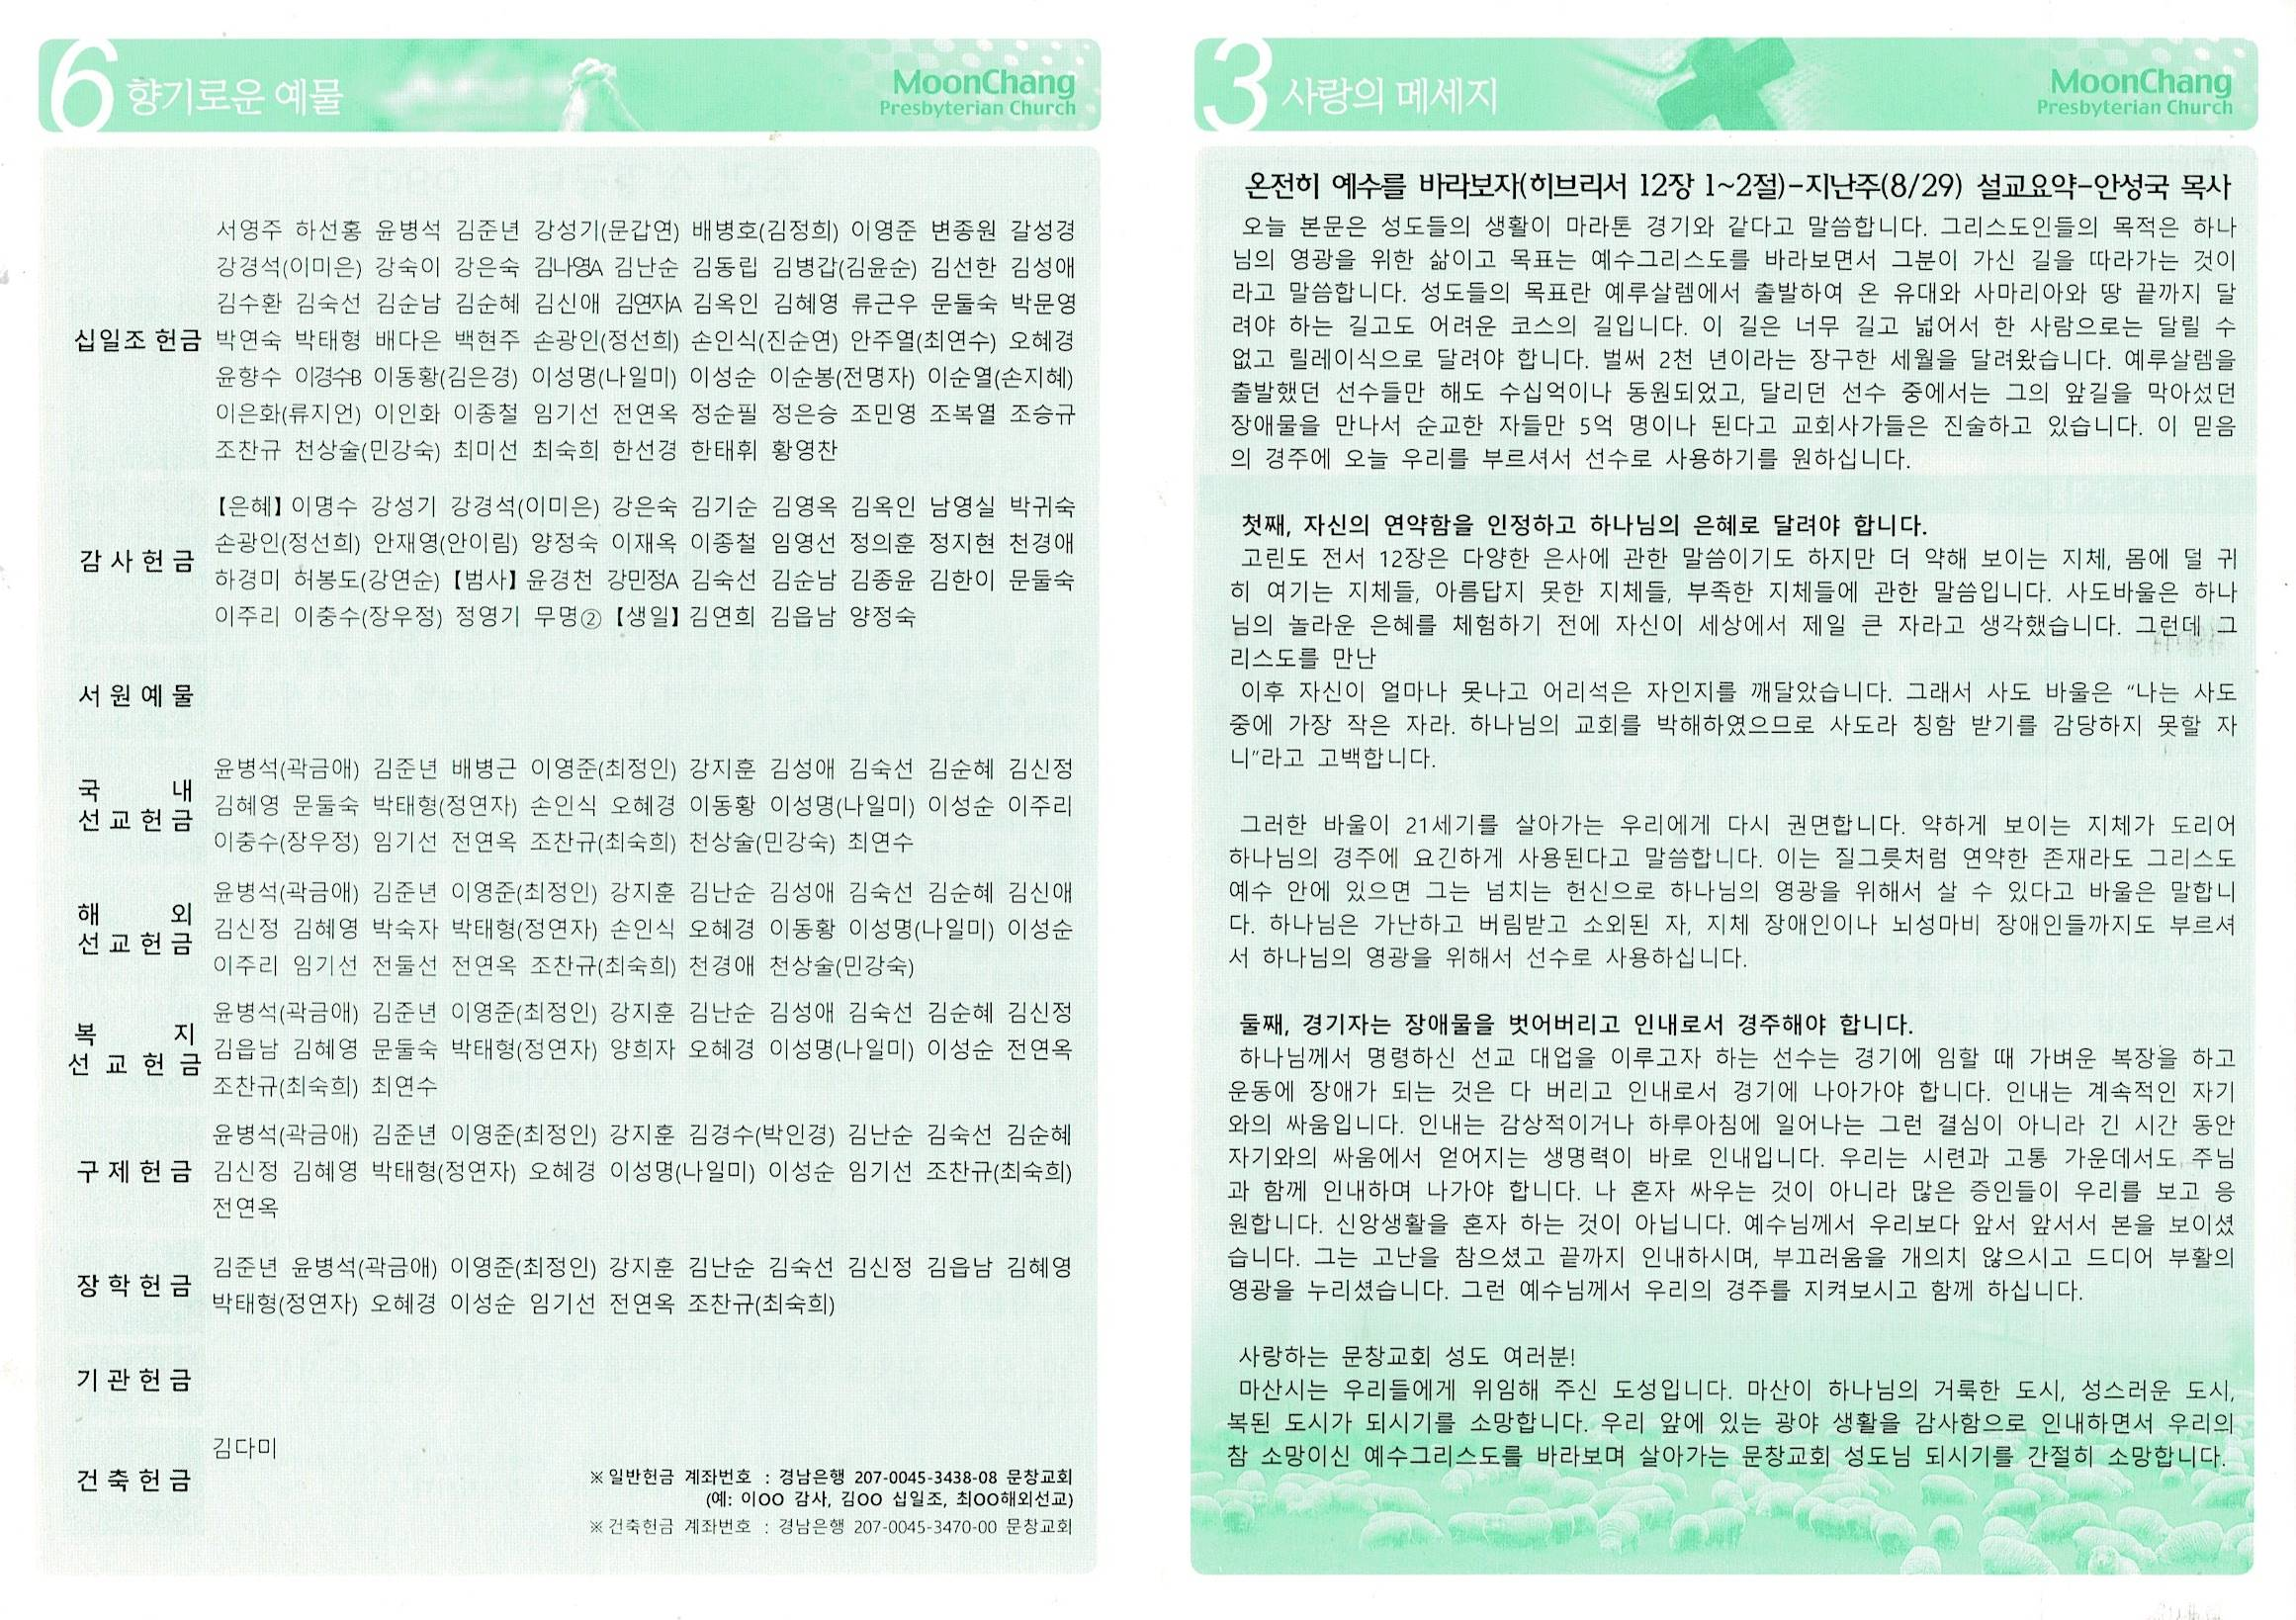 Scan2021-09-04_114128_002.jpg